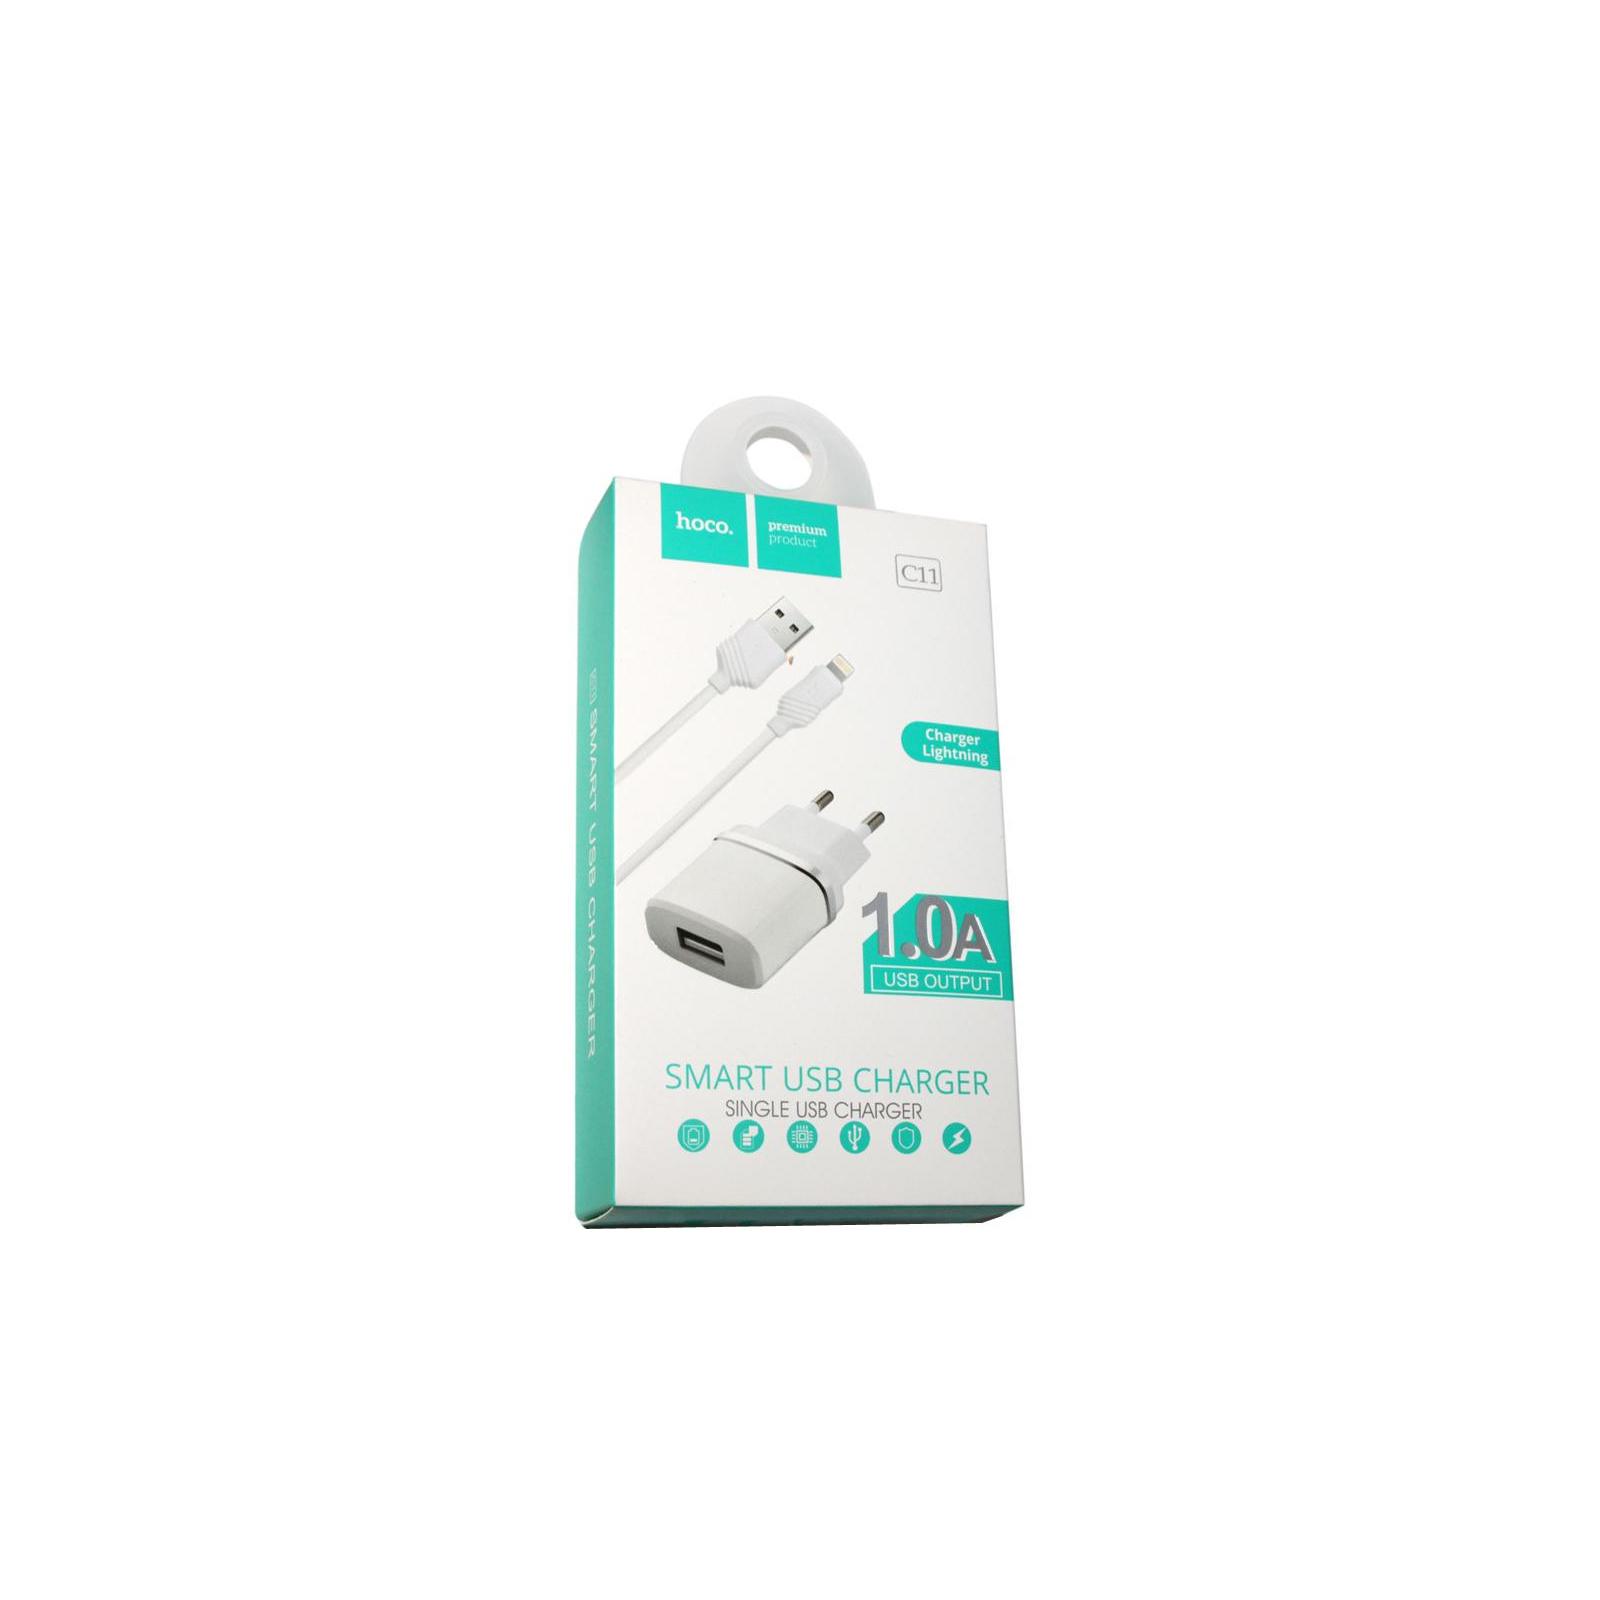 Зарядное устройство HOCO C11 1*USB, 1A, White + USB Cable iPhone 6 (60788) изображение 3